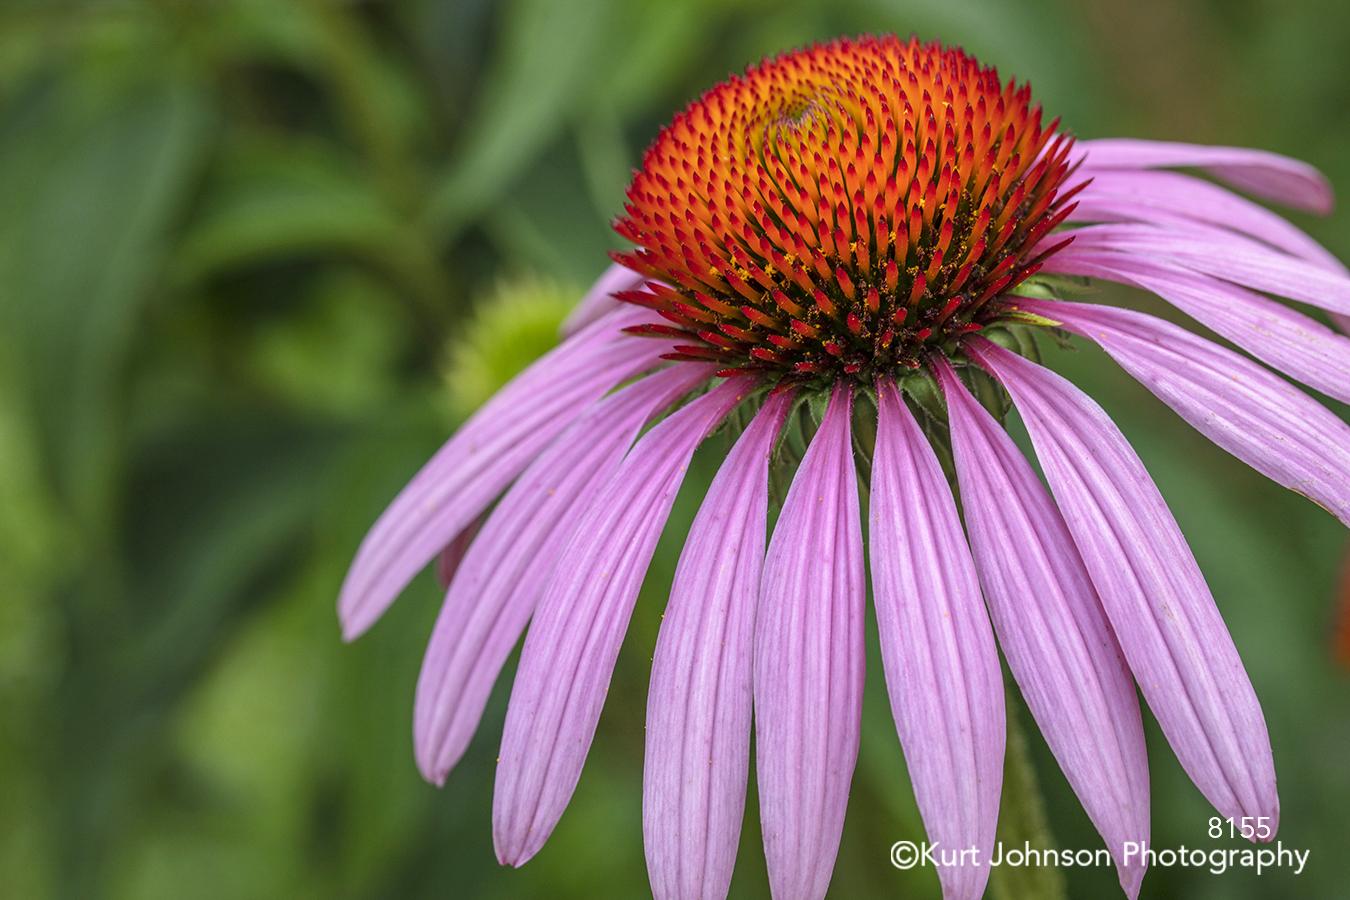 pink purple coneflower flower petal petals close up bright happy macro detail wildflower green grass orange